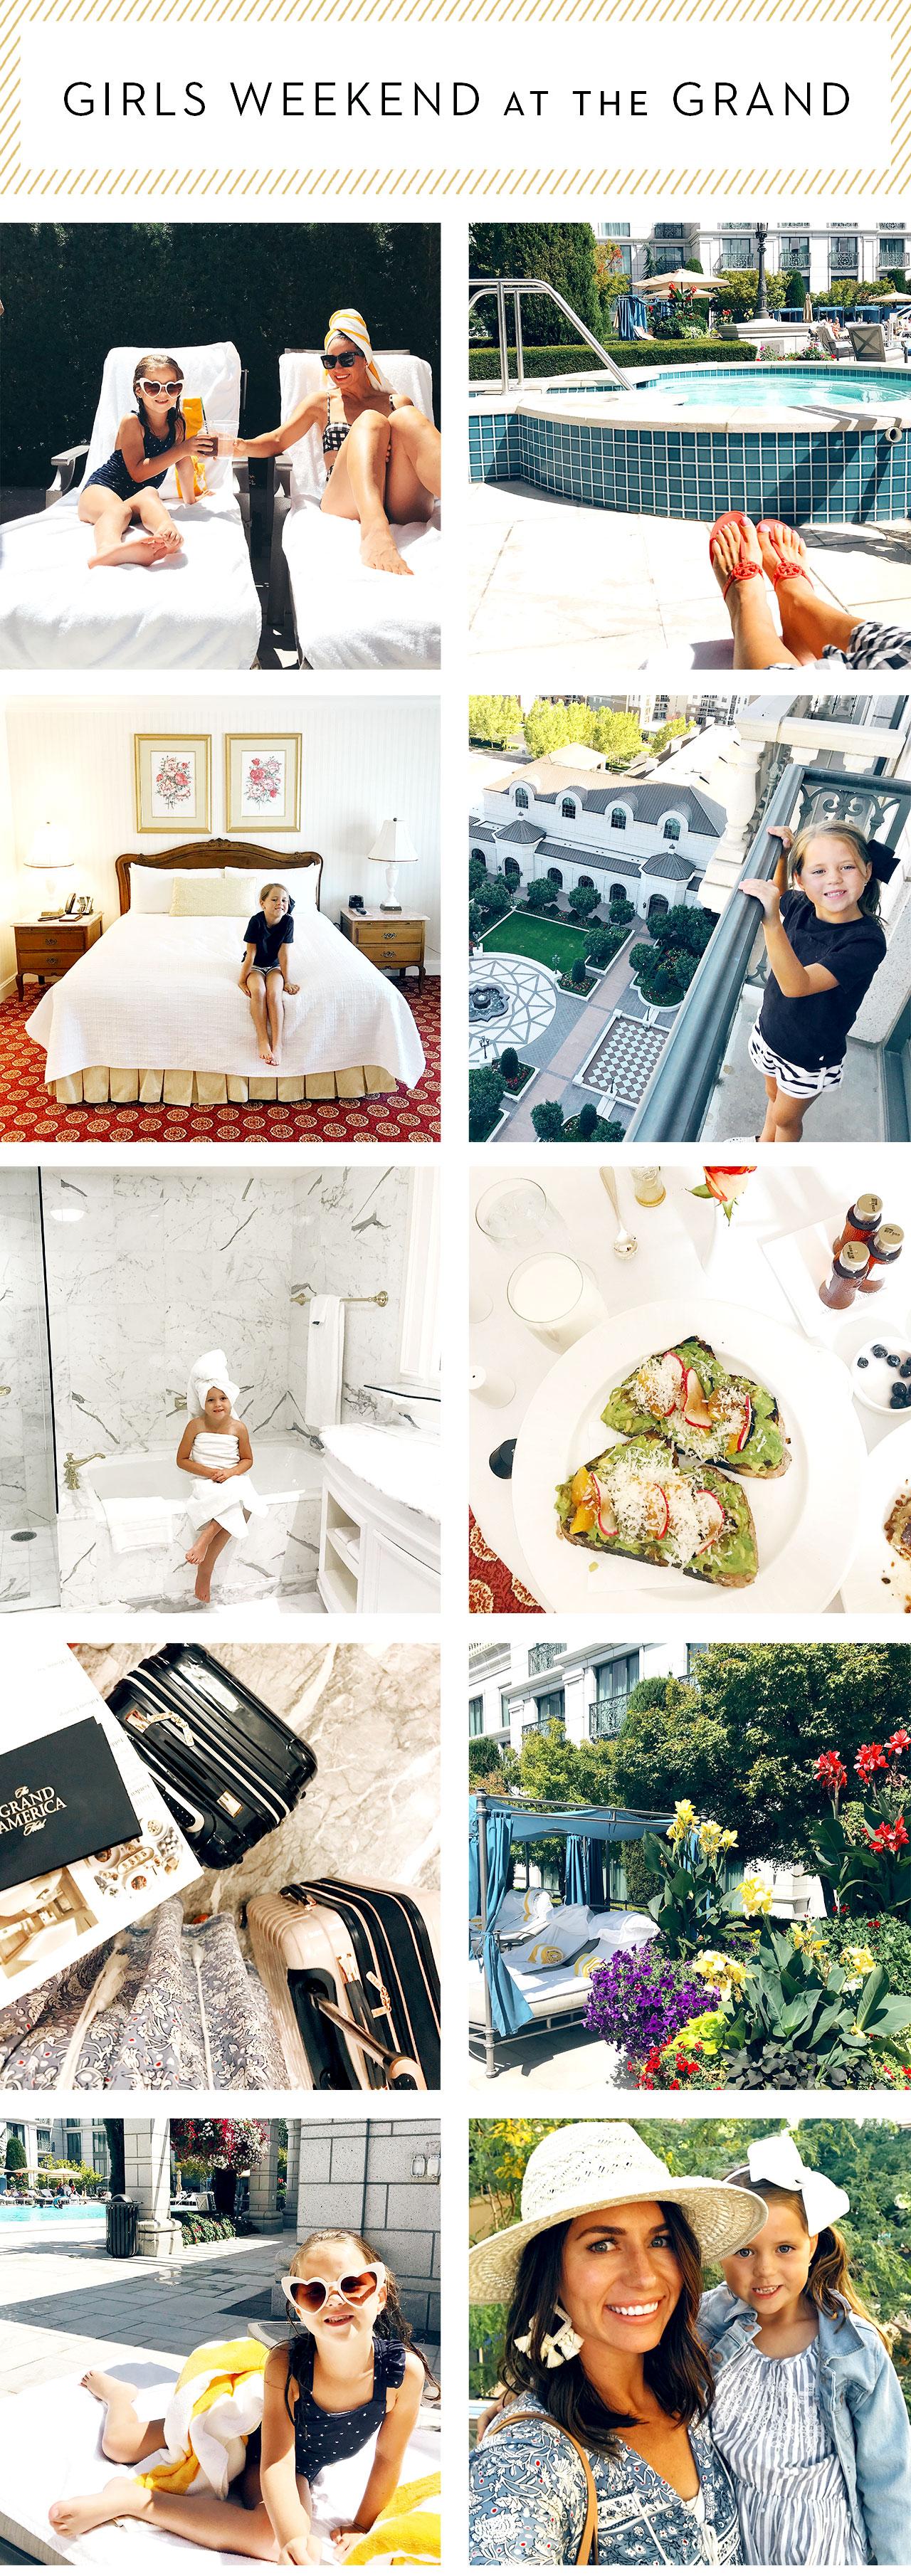 Grand-America-Hotel.jpg